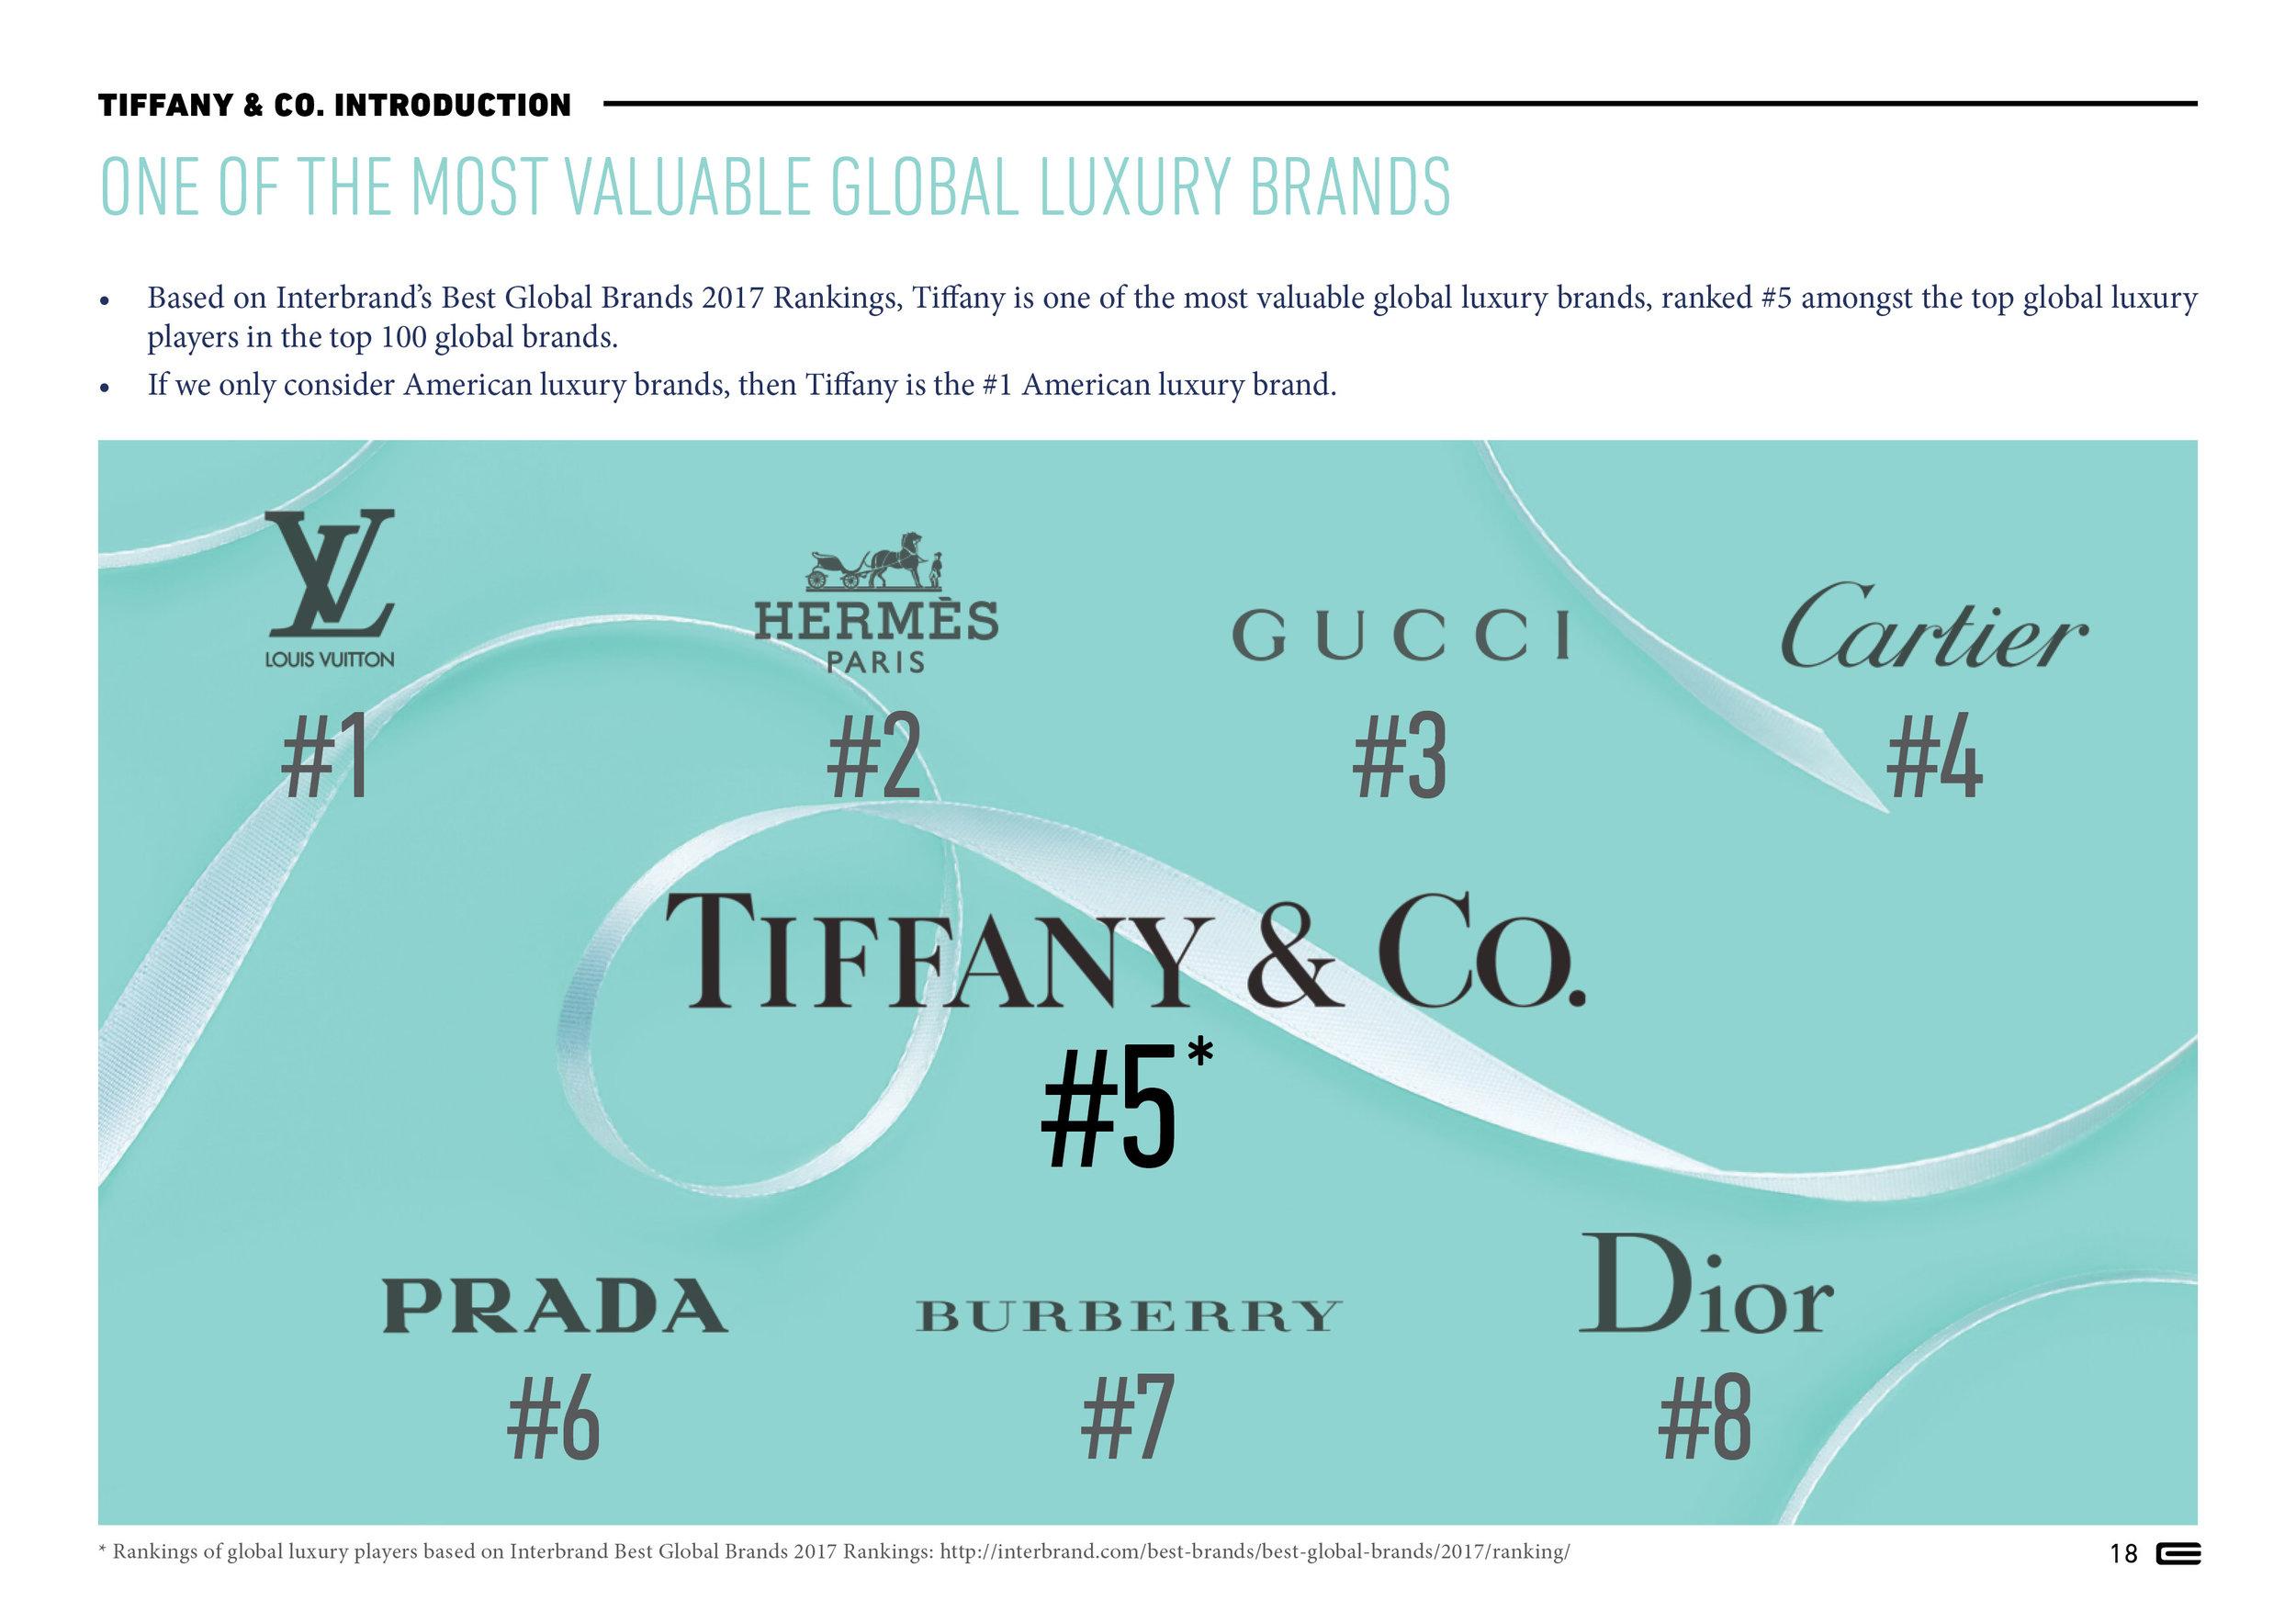 EC - VIC 2018 Presentation on Tiffany18.jpg